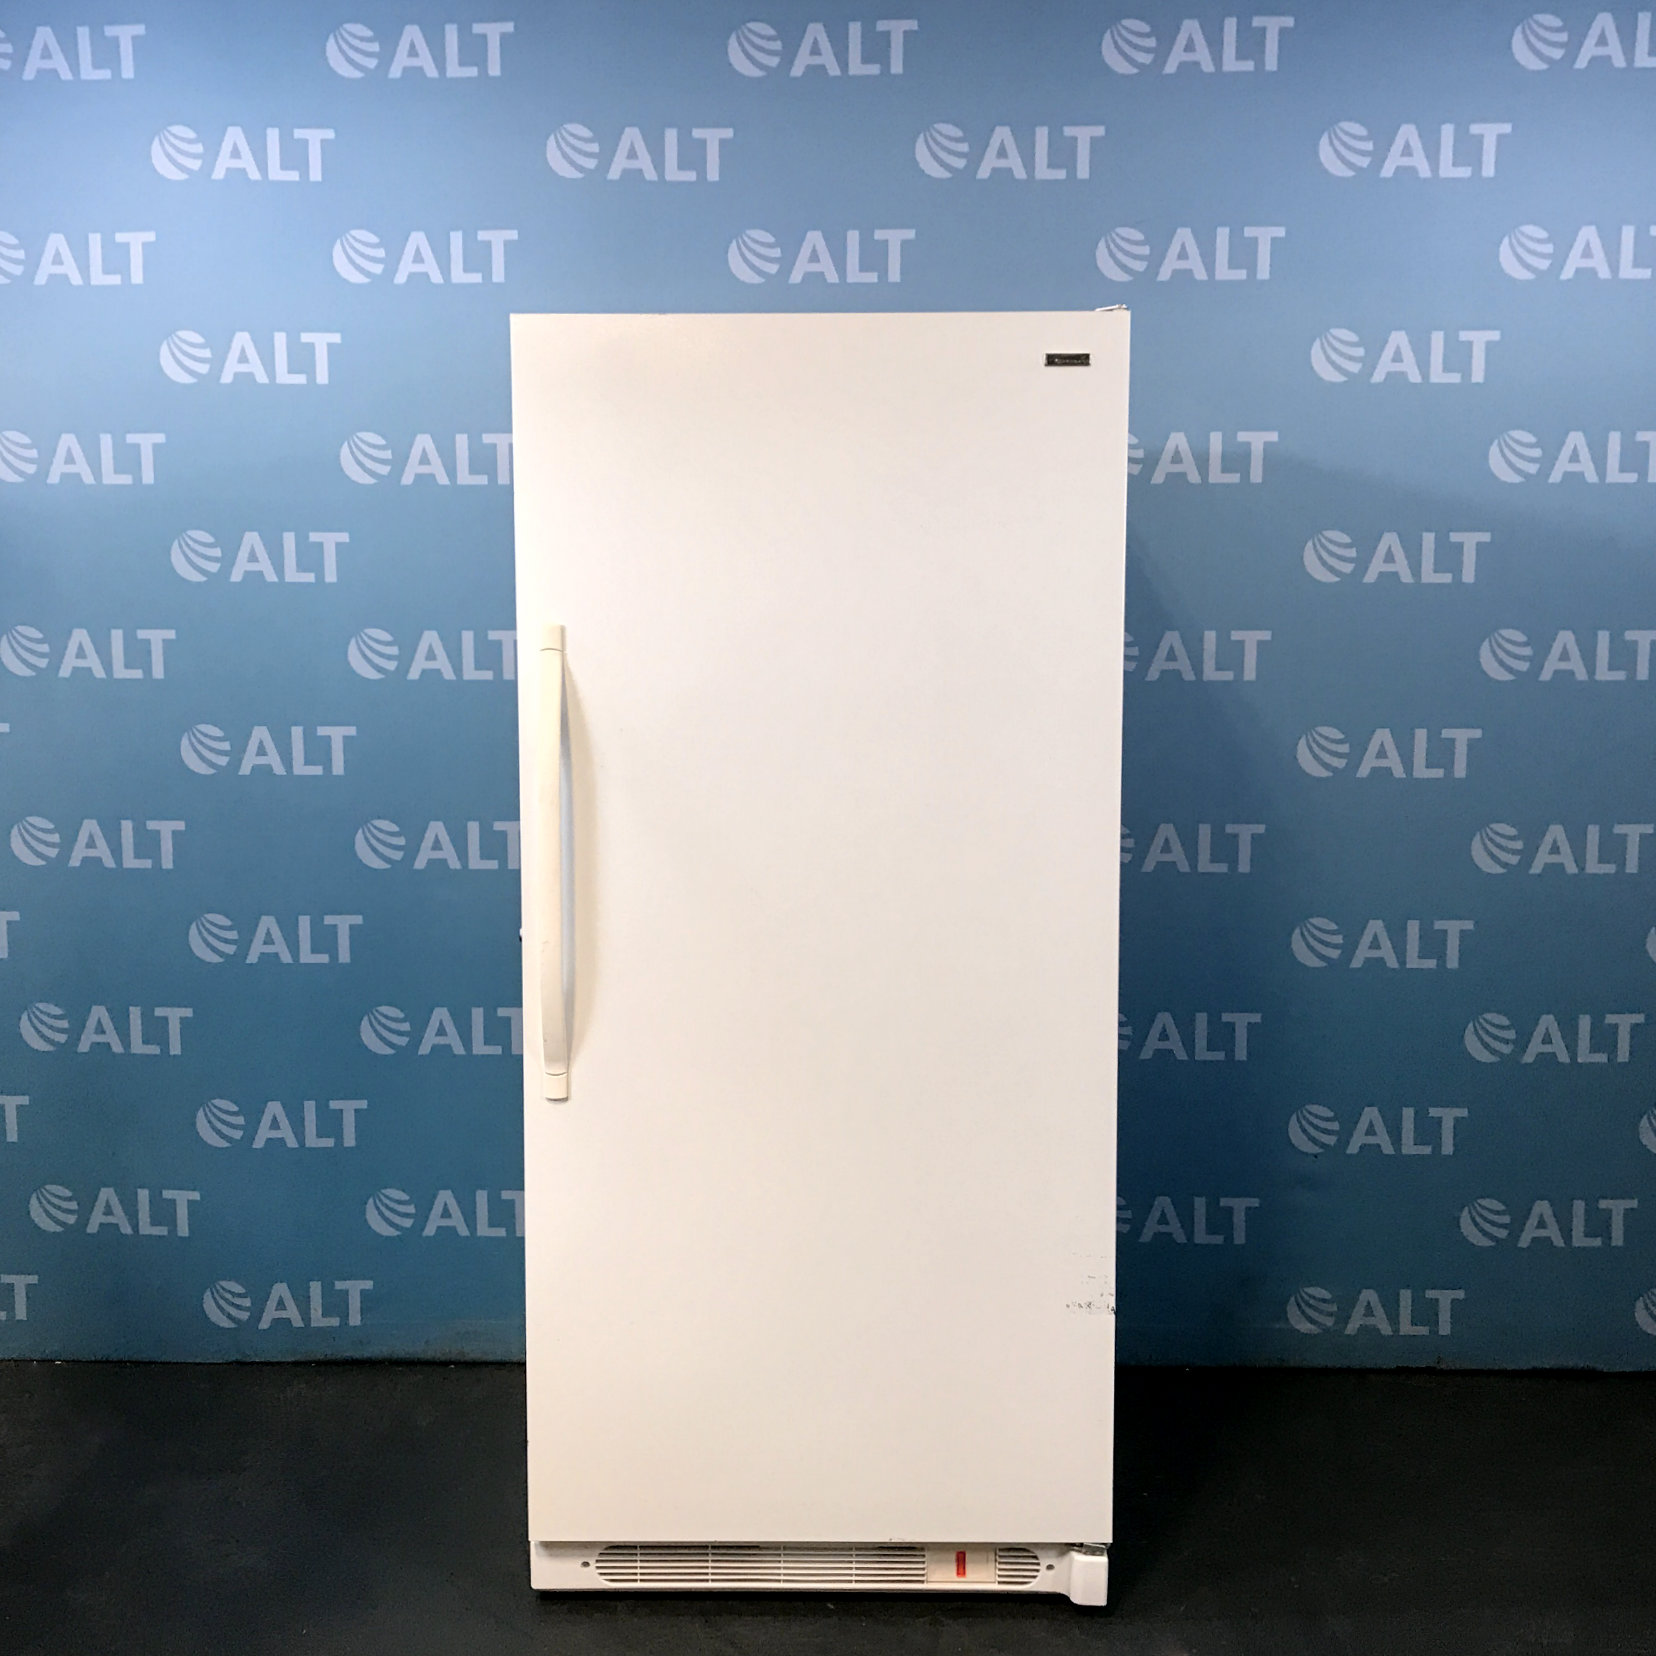 Kenmore 253.28042805 Upright Freezer Image